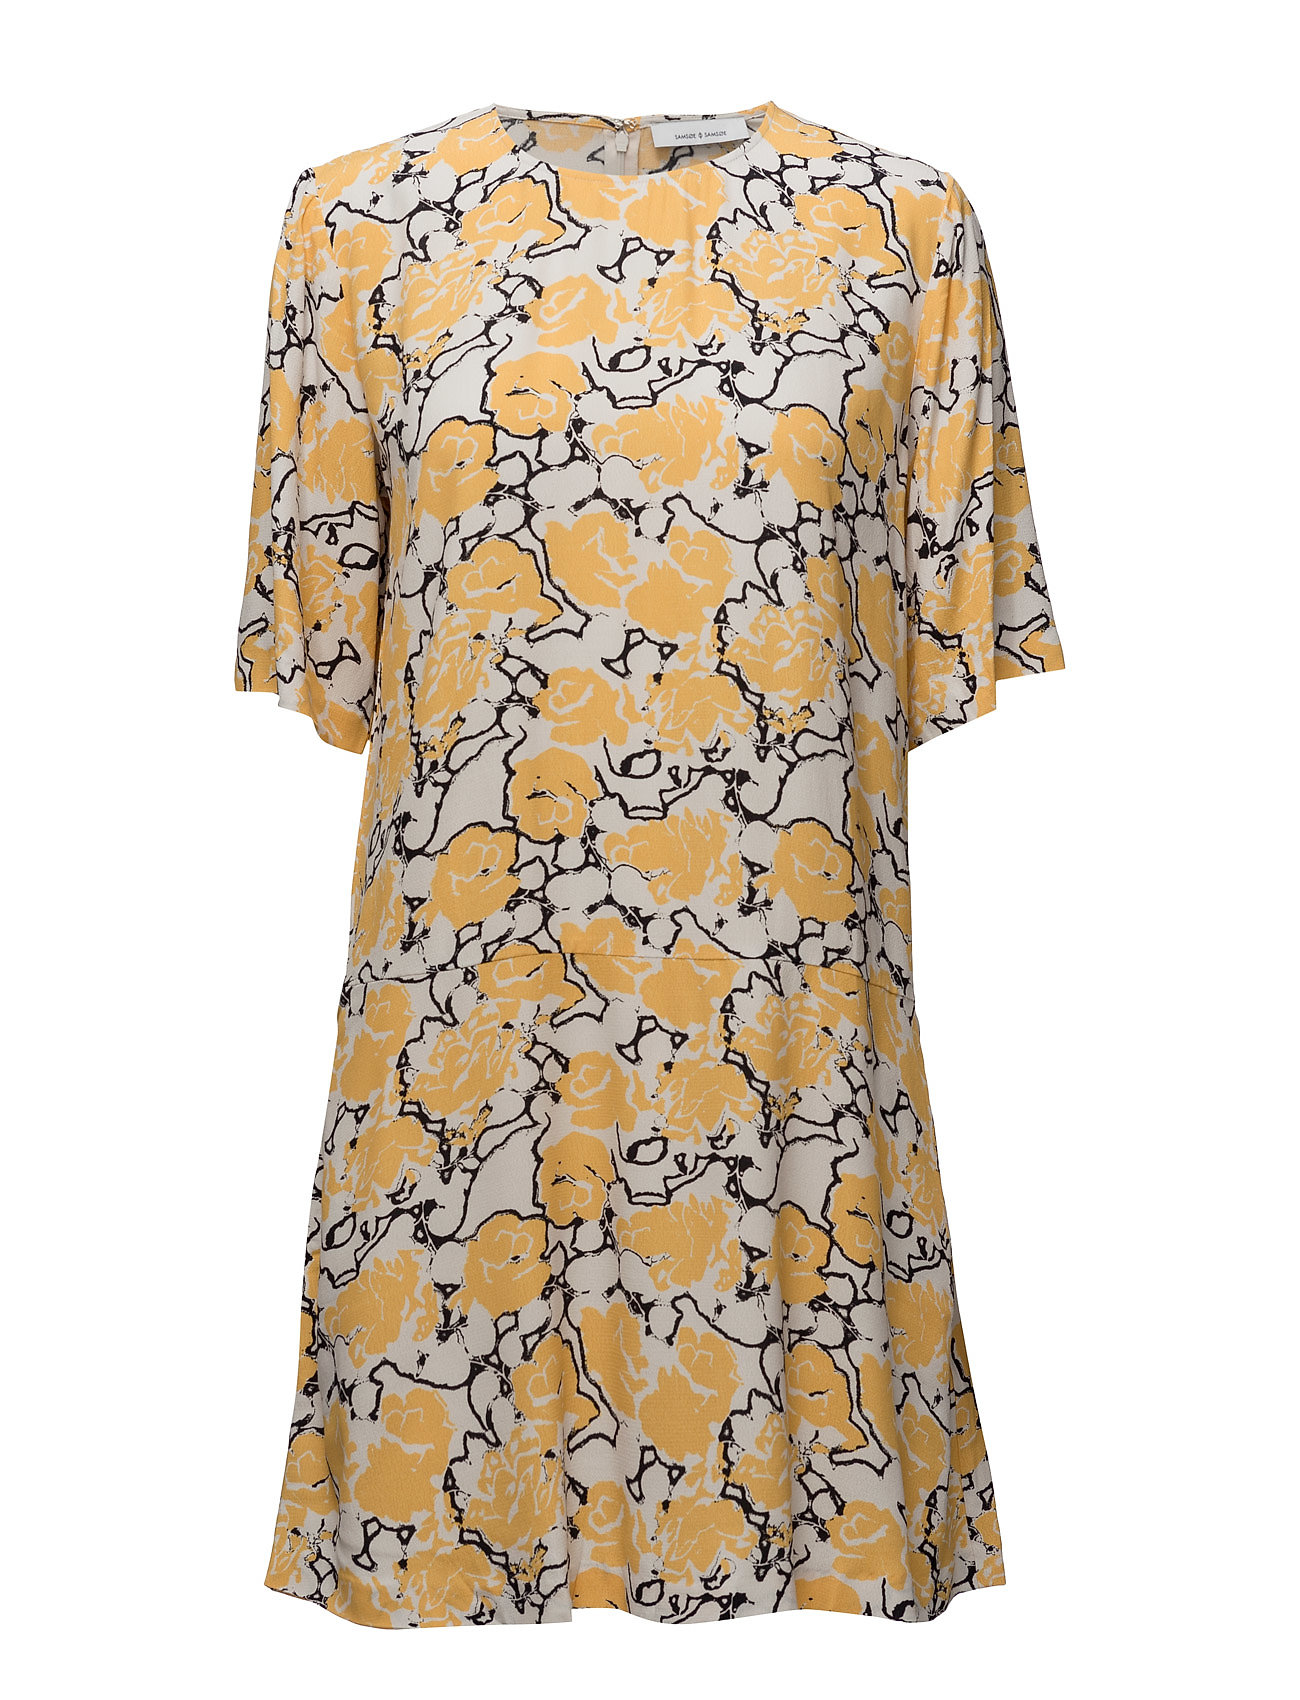 e81770c0 Adelaide Dress Aop 6515 Samsøe & Samsøe Korte kjoler til Damer i ...